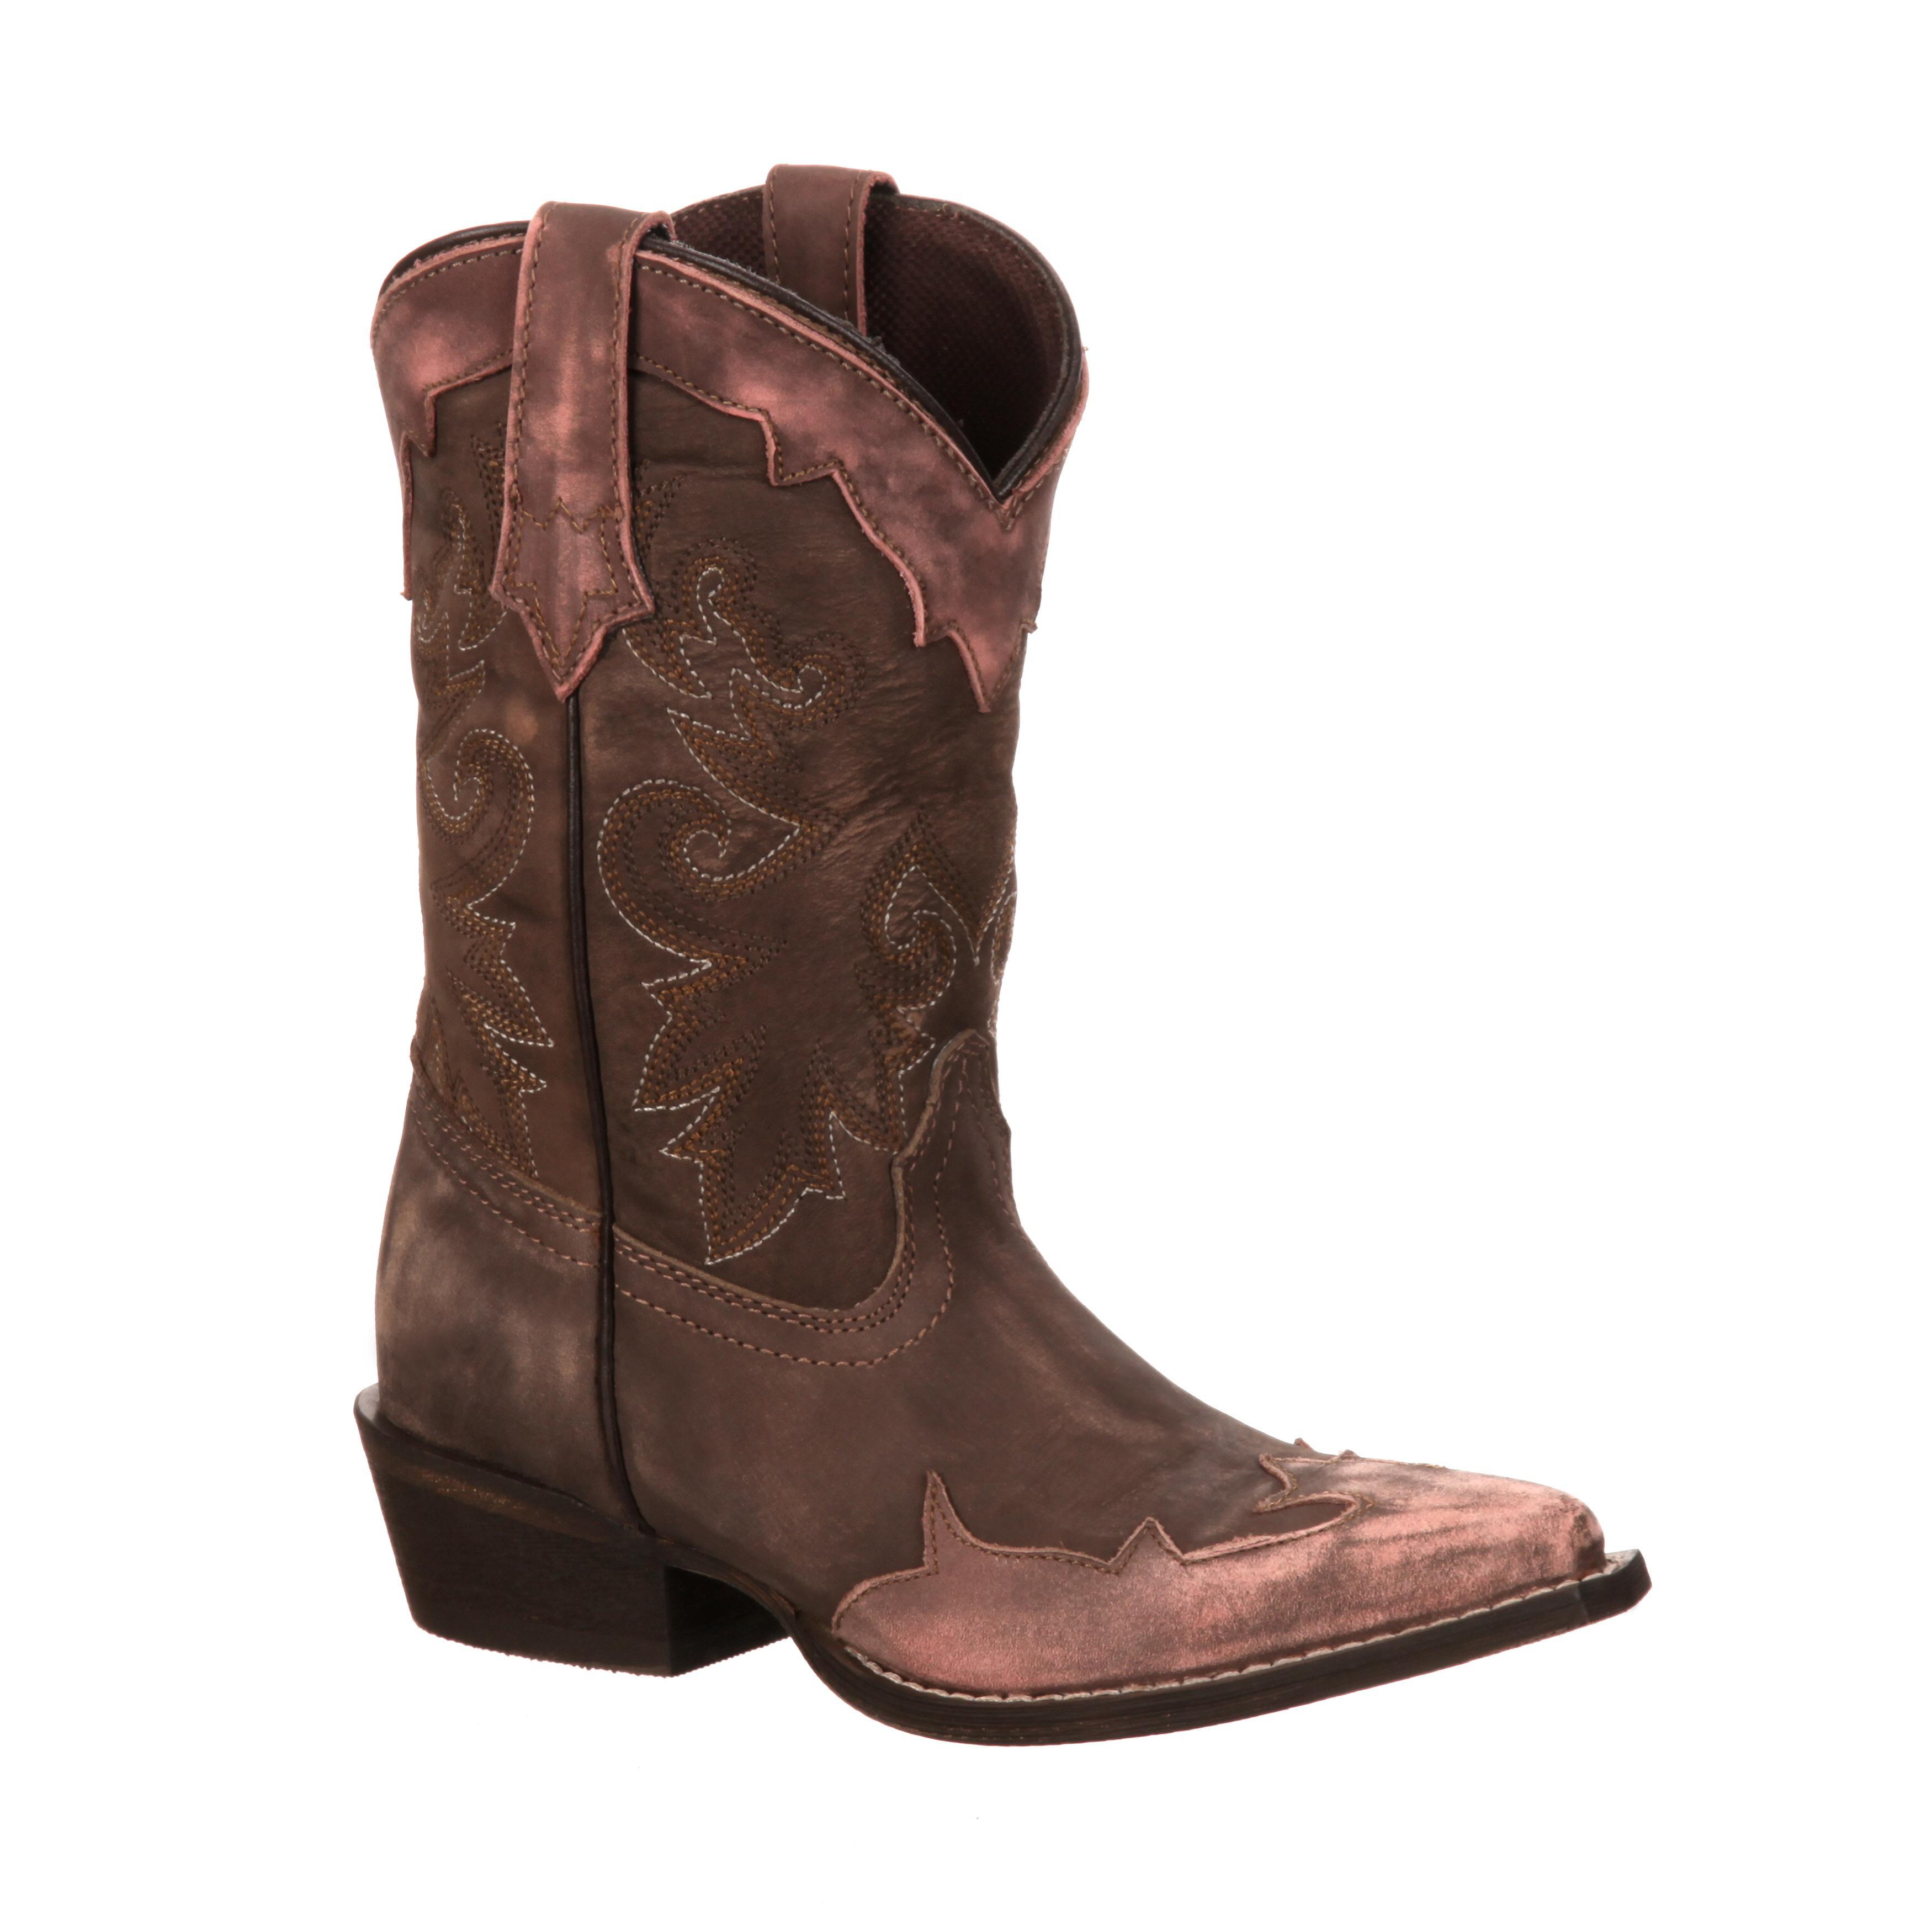 Lil39 Durango Adolescent Western Overlay Boots Dwbt038